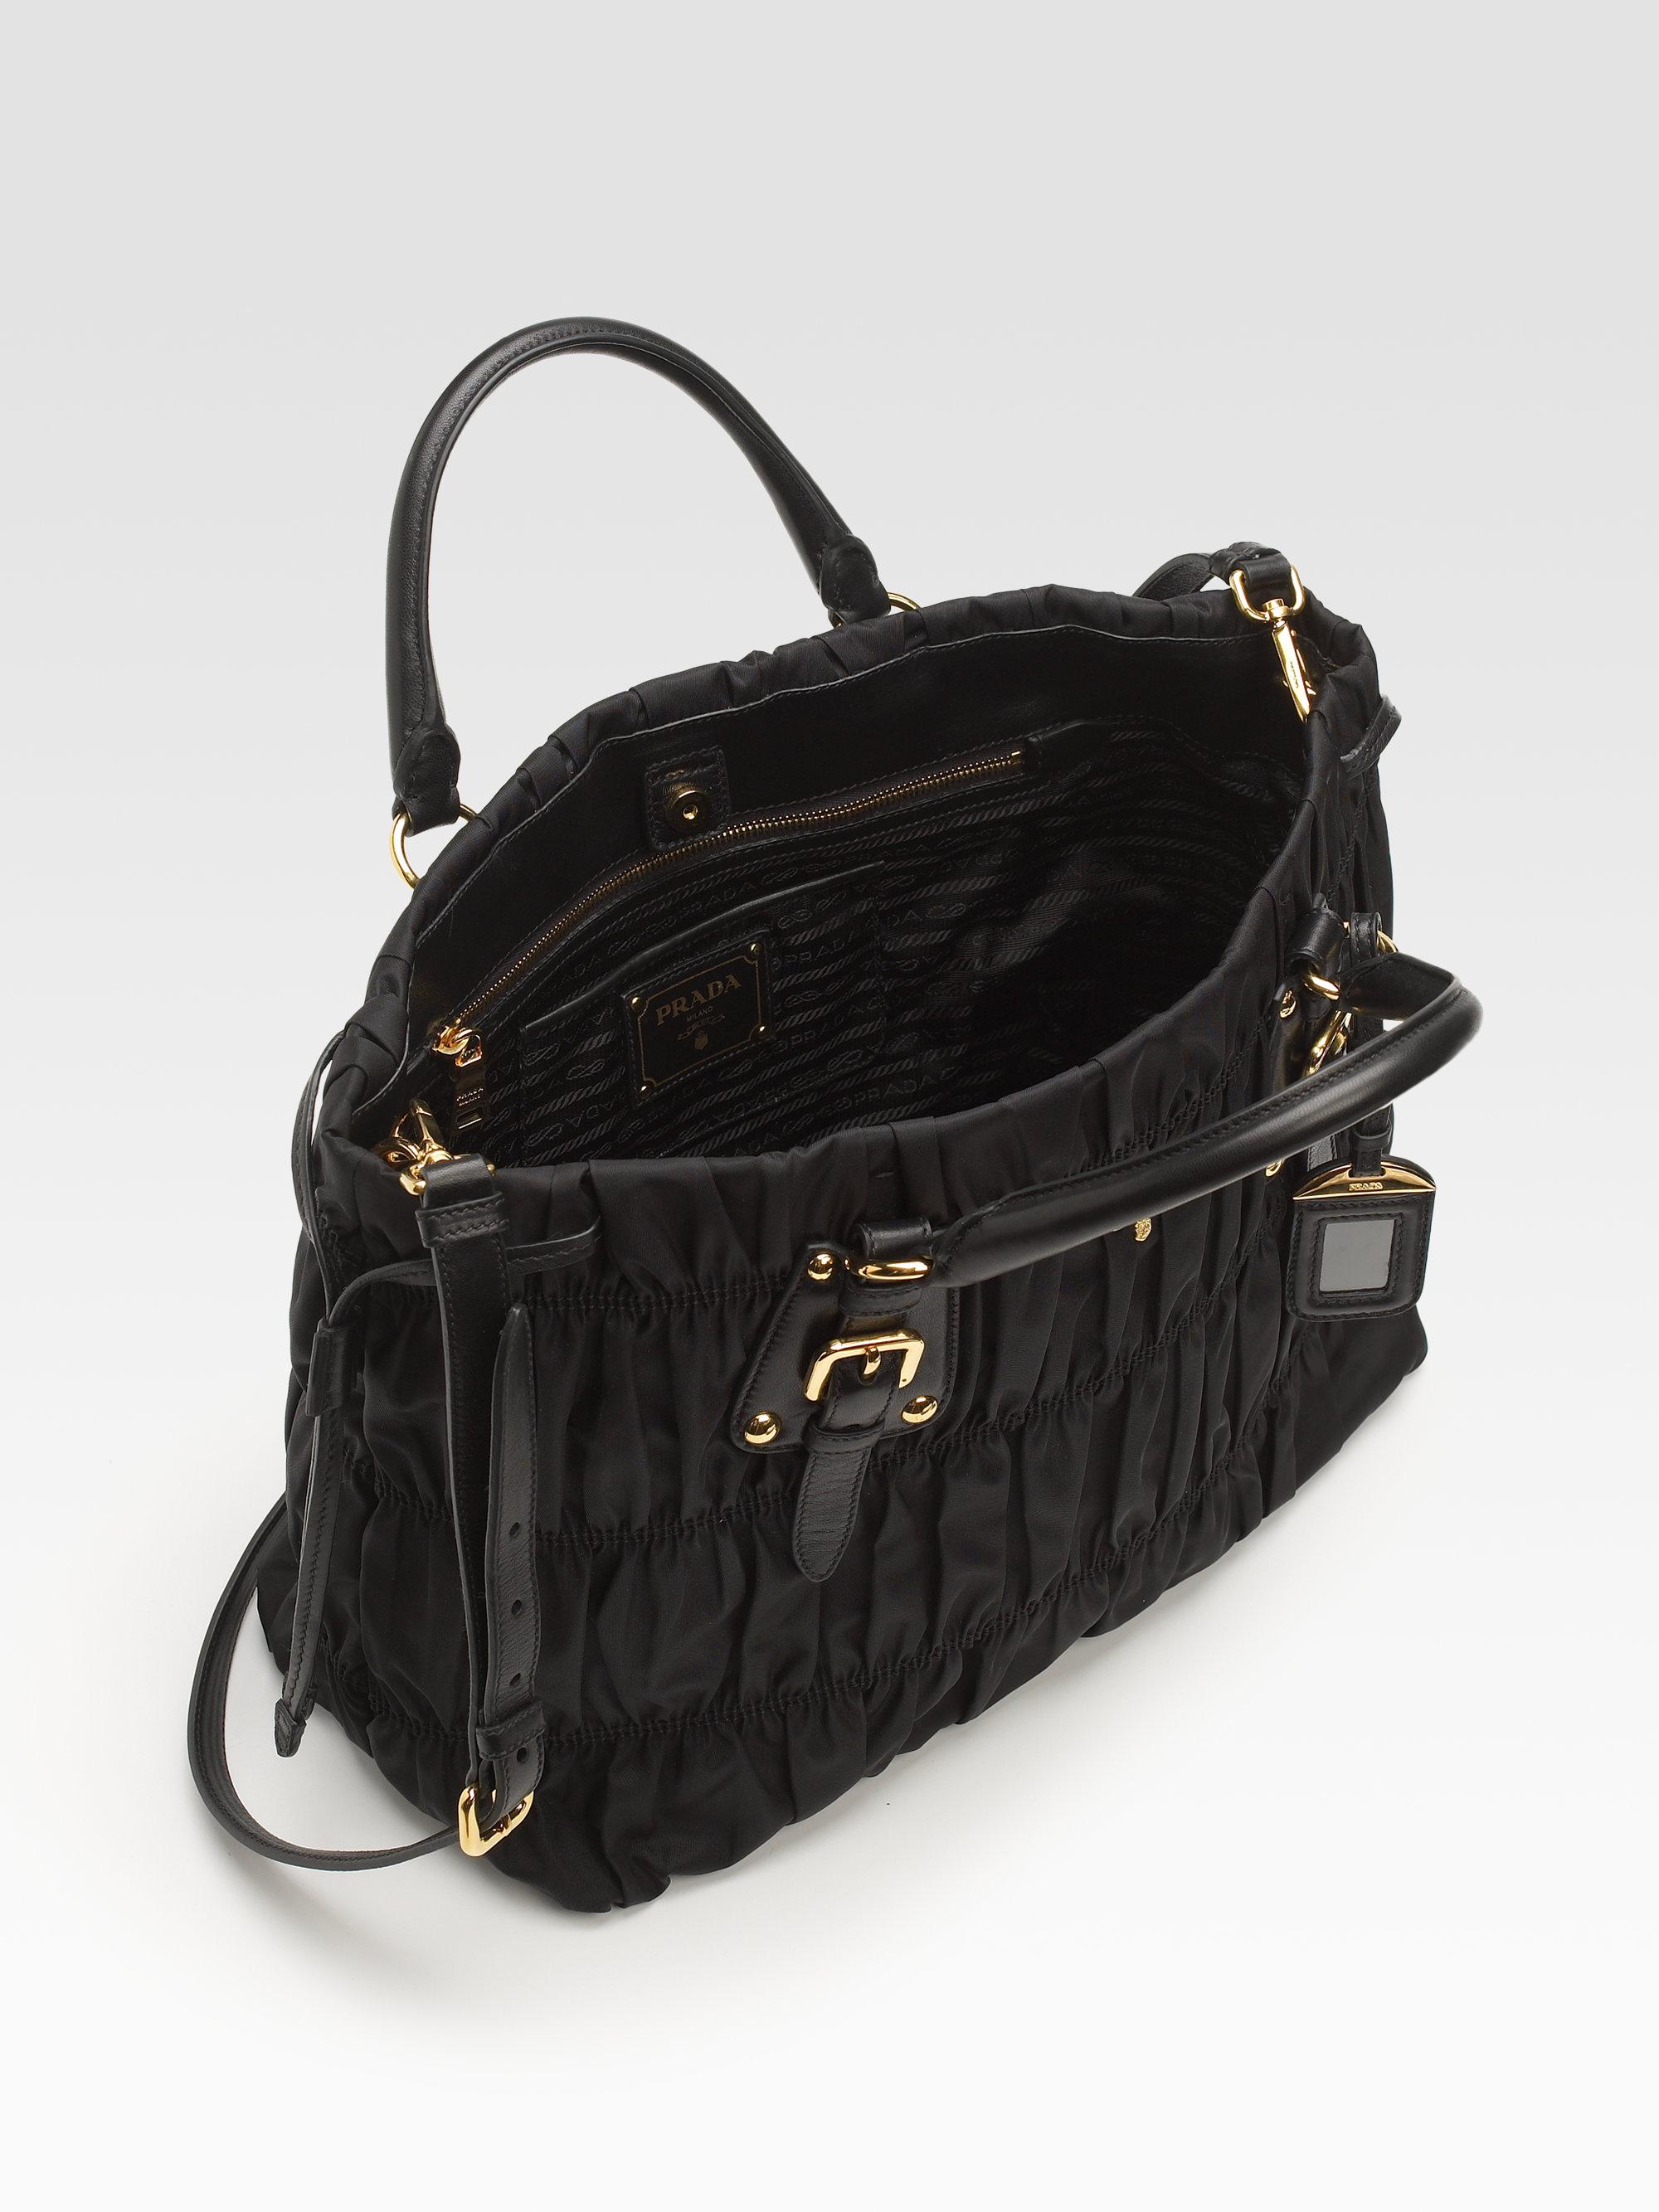 ... purchase good lyst prada tessuto gaufre tote bag in black a8447 143c0  e3e50 e6e4a b12c17fc9063d